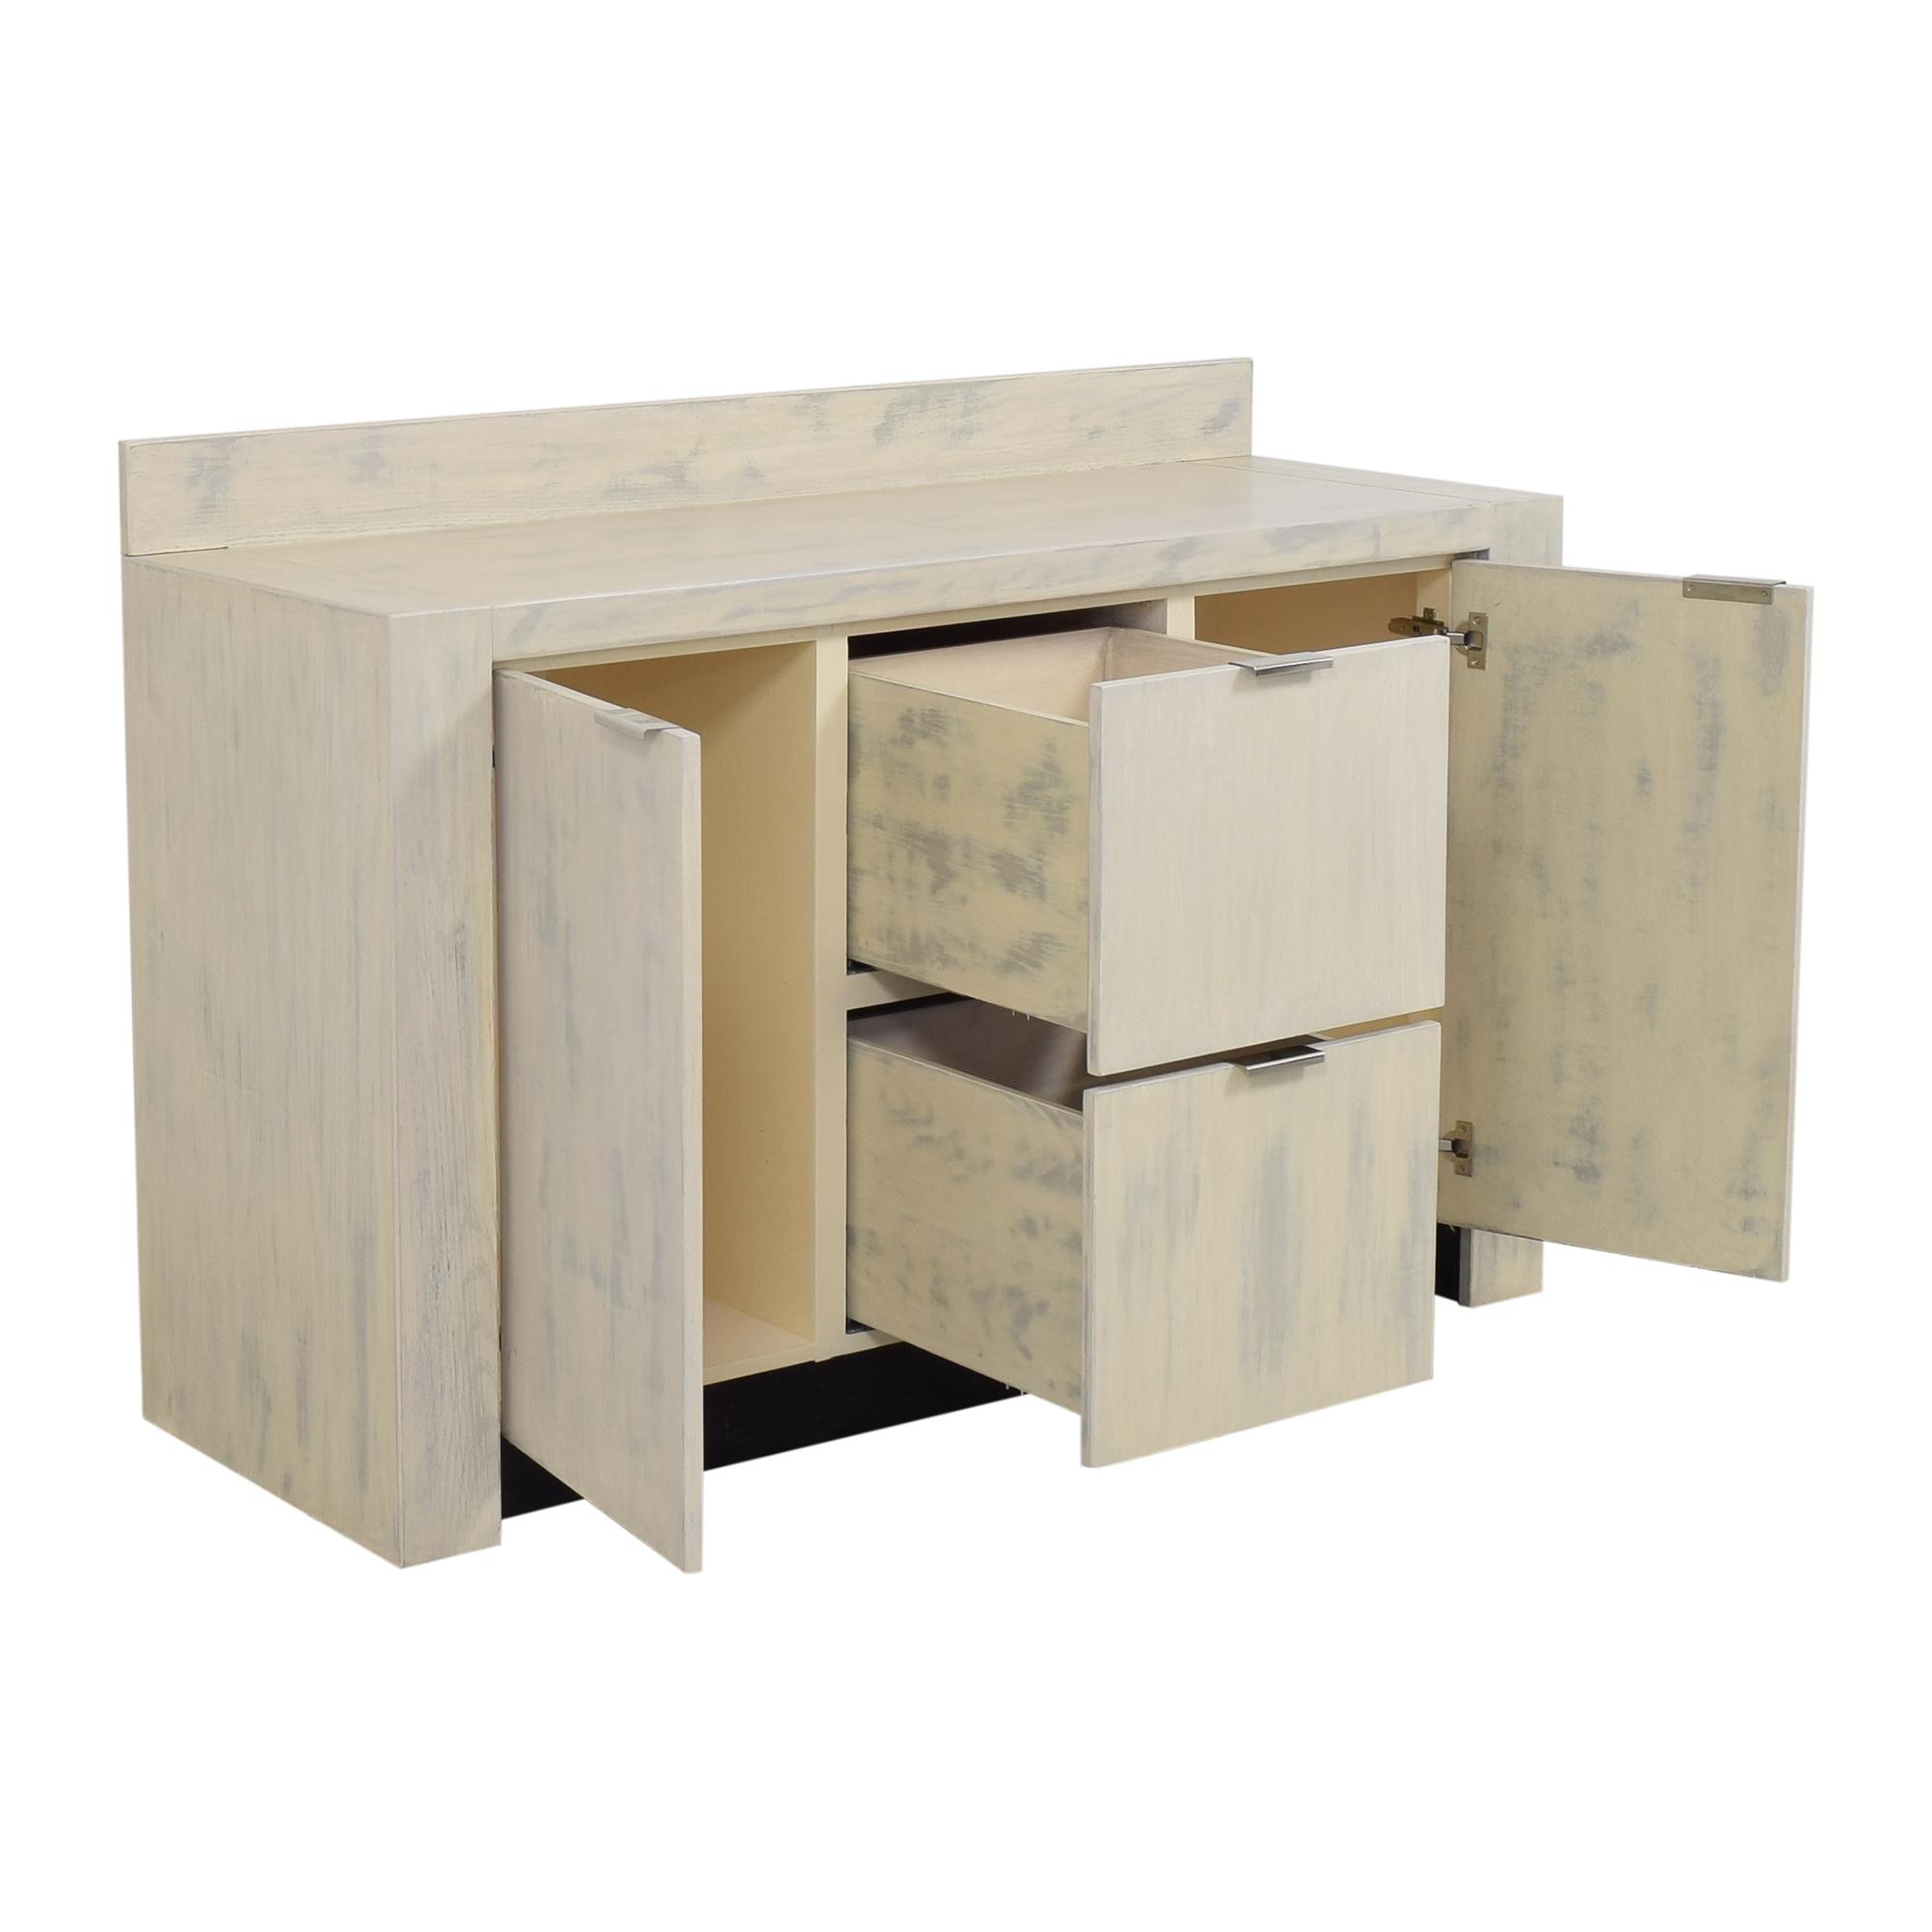 Custom Two Door Sideboard Cabinets & Sideboards